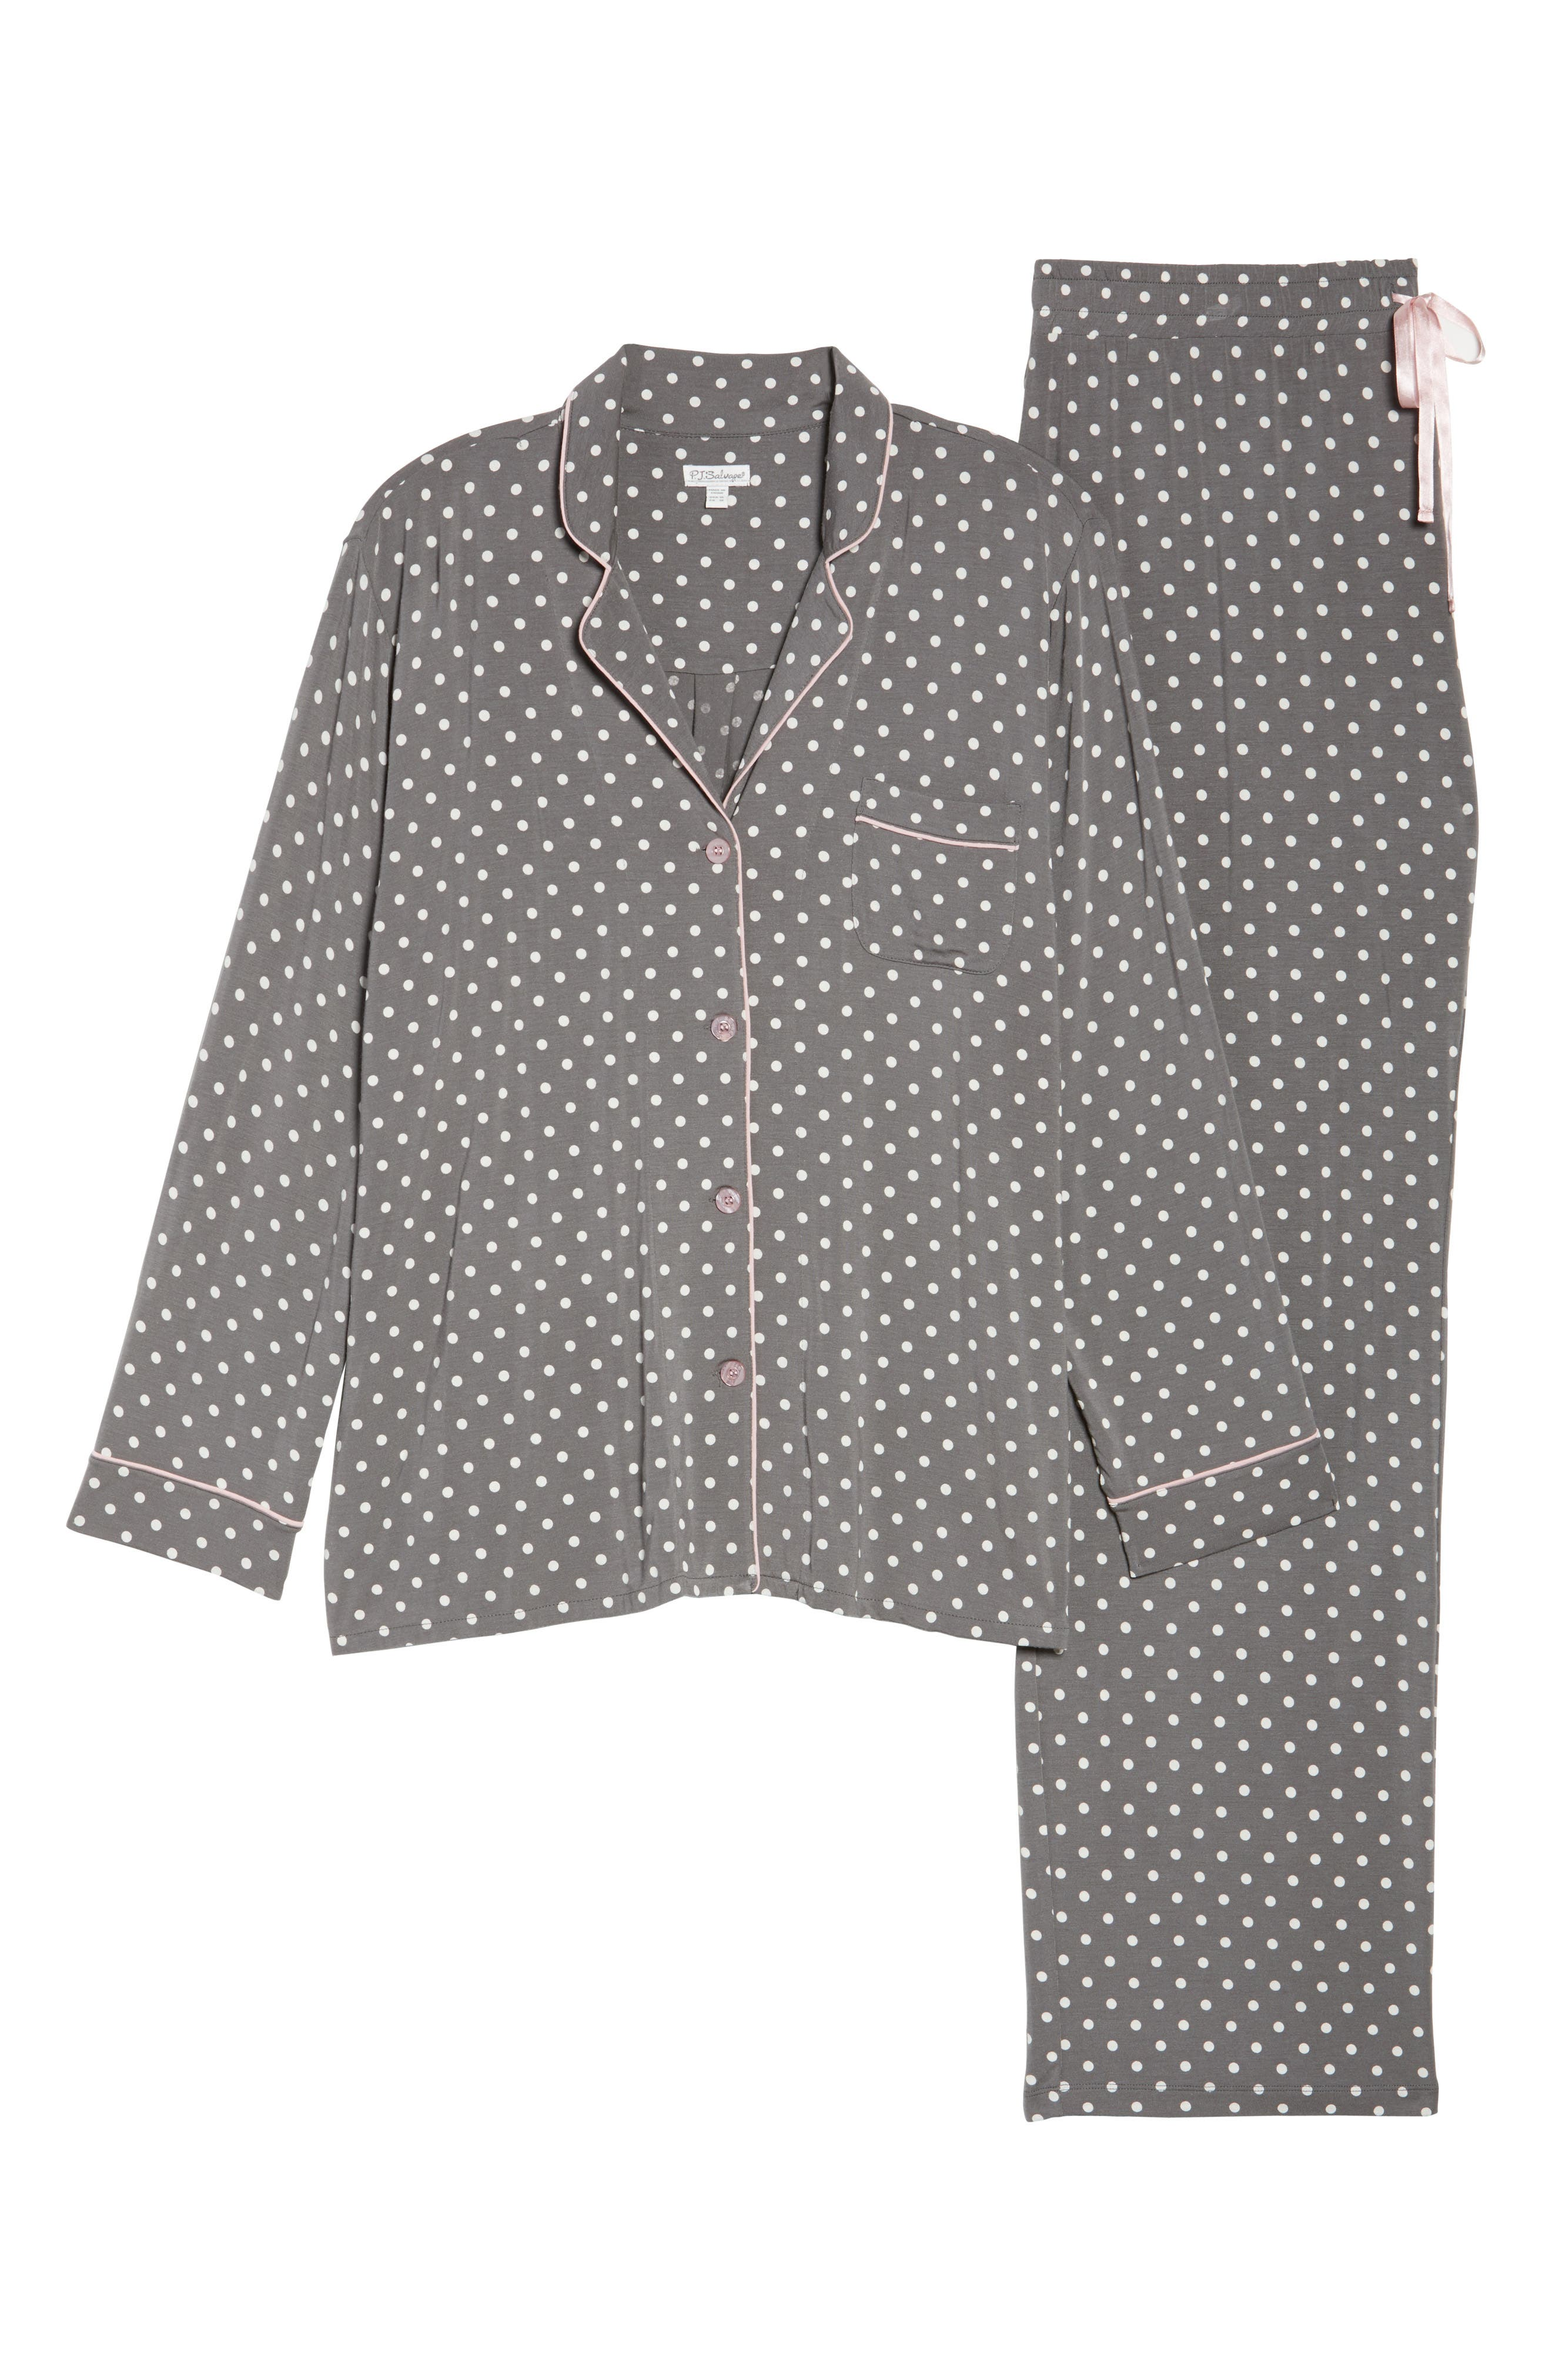 Polka Dot Pajamas,                             Alternate thumbnail 4, color,                             Charcoal